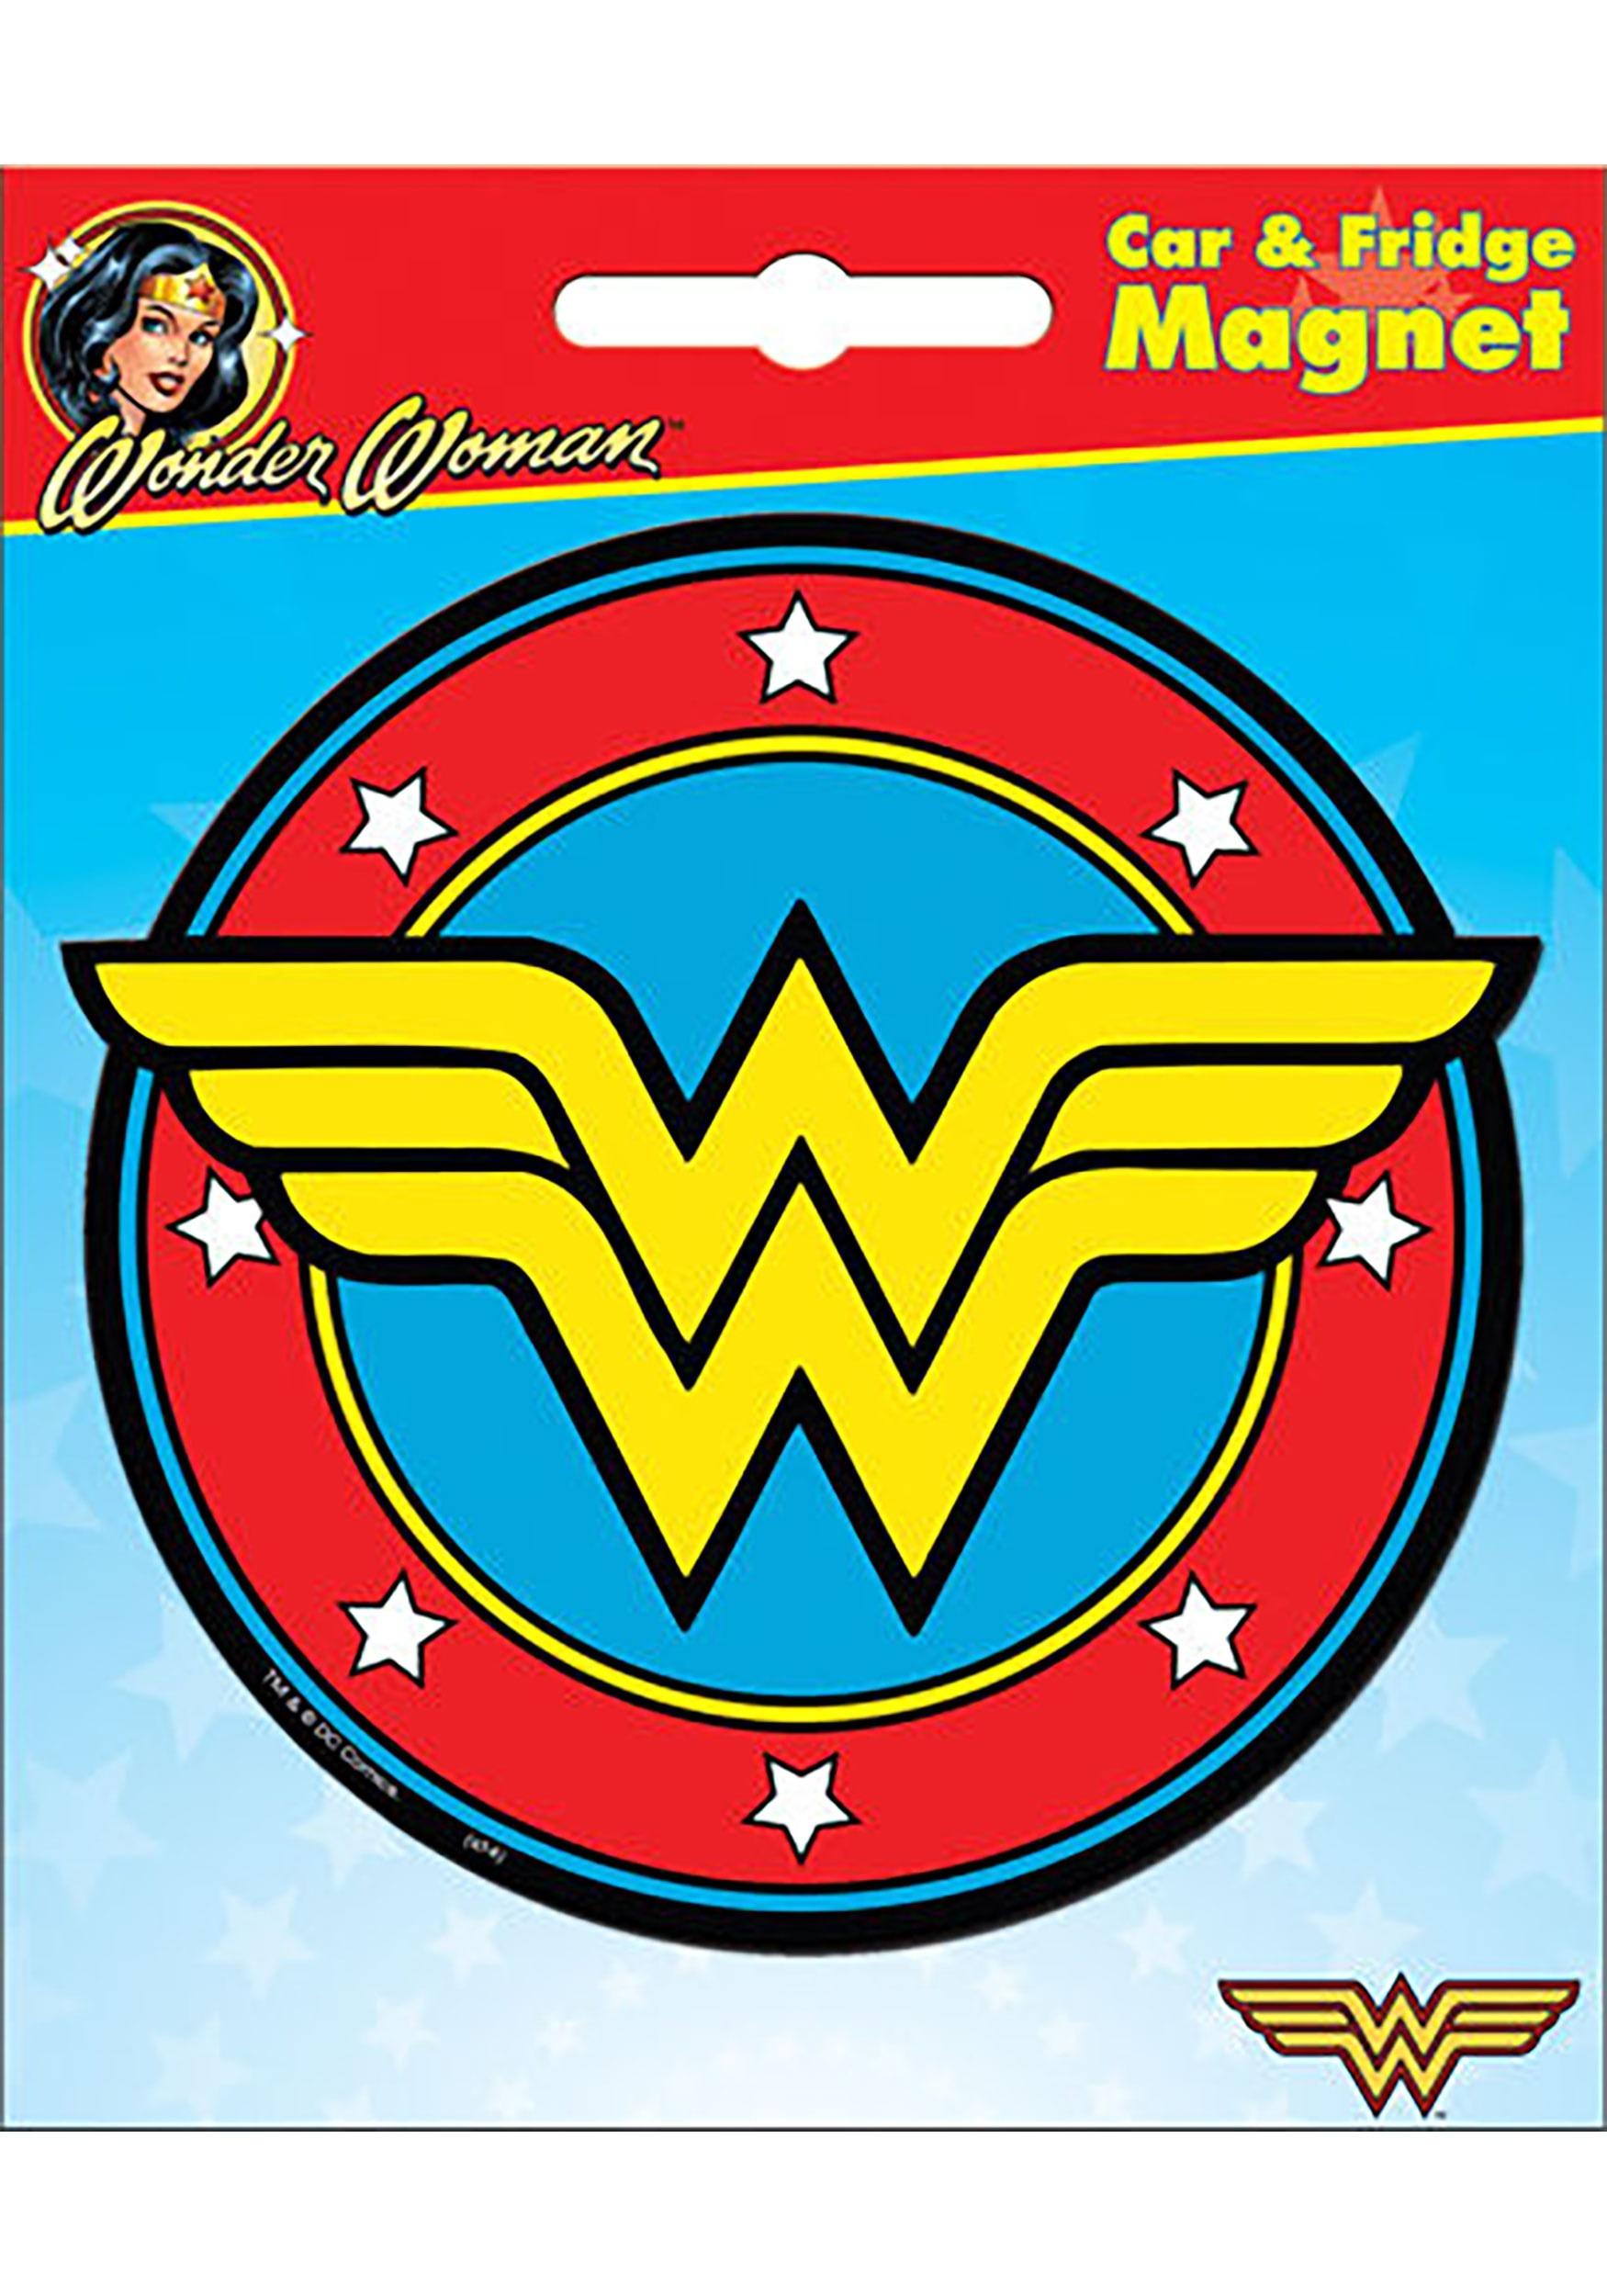 DC_Wonder_Woman_Logo_Car_Magnet